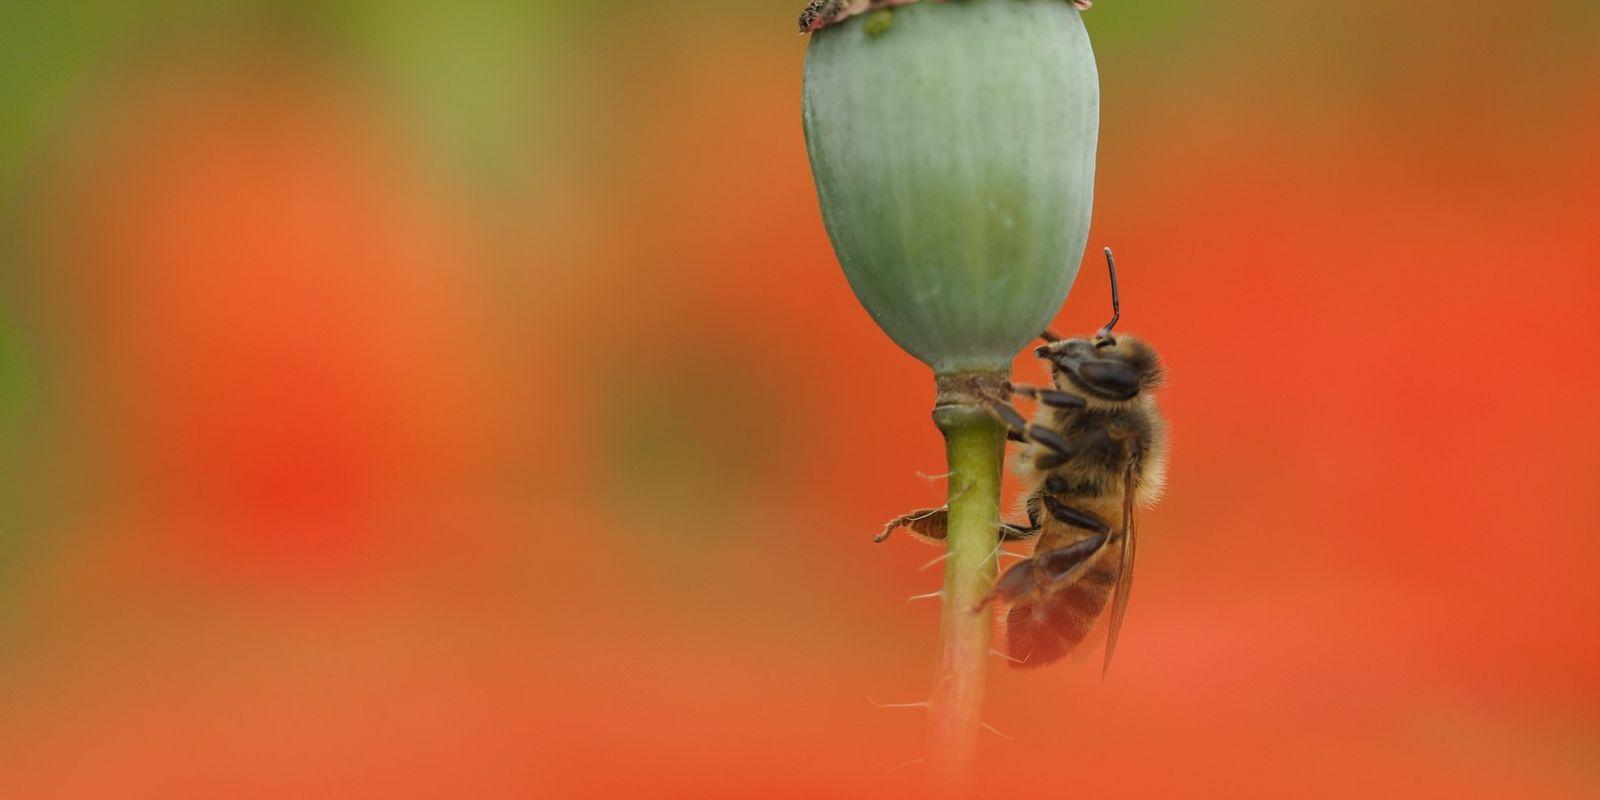 NKL Bloemenweide natuurakker Olst Klaproos insect (5) (Large)